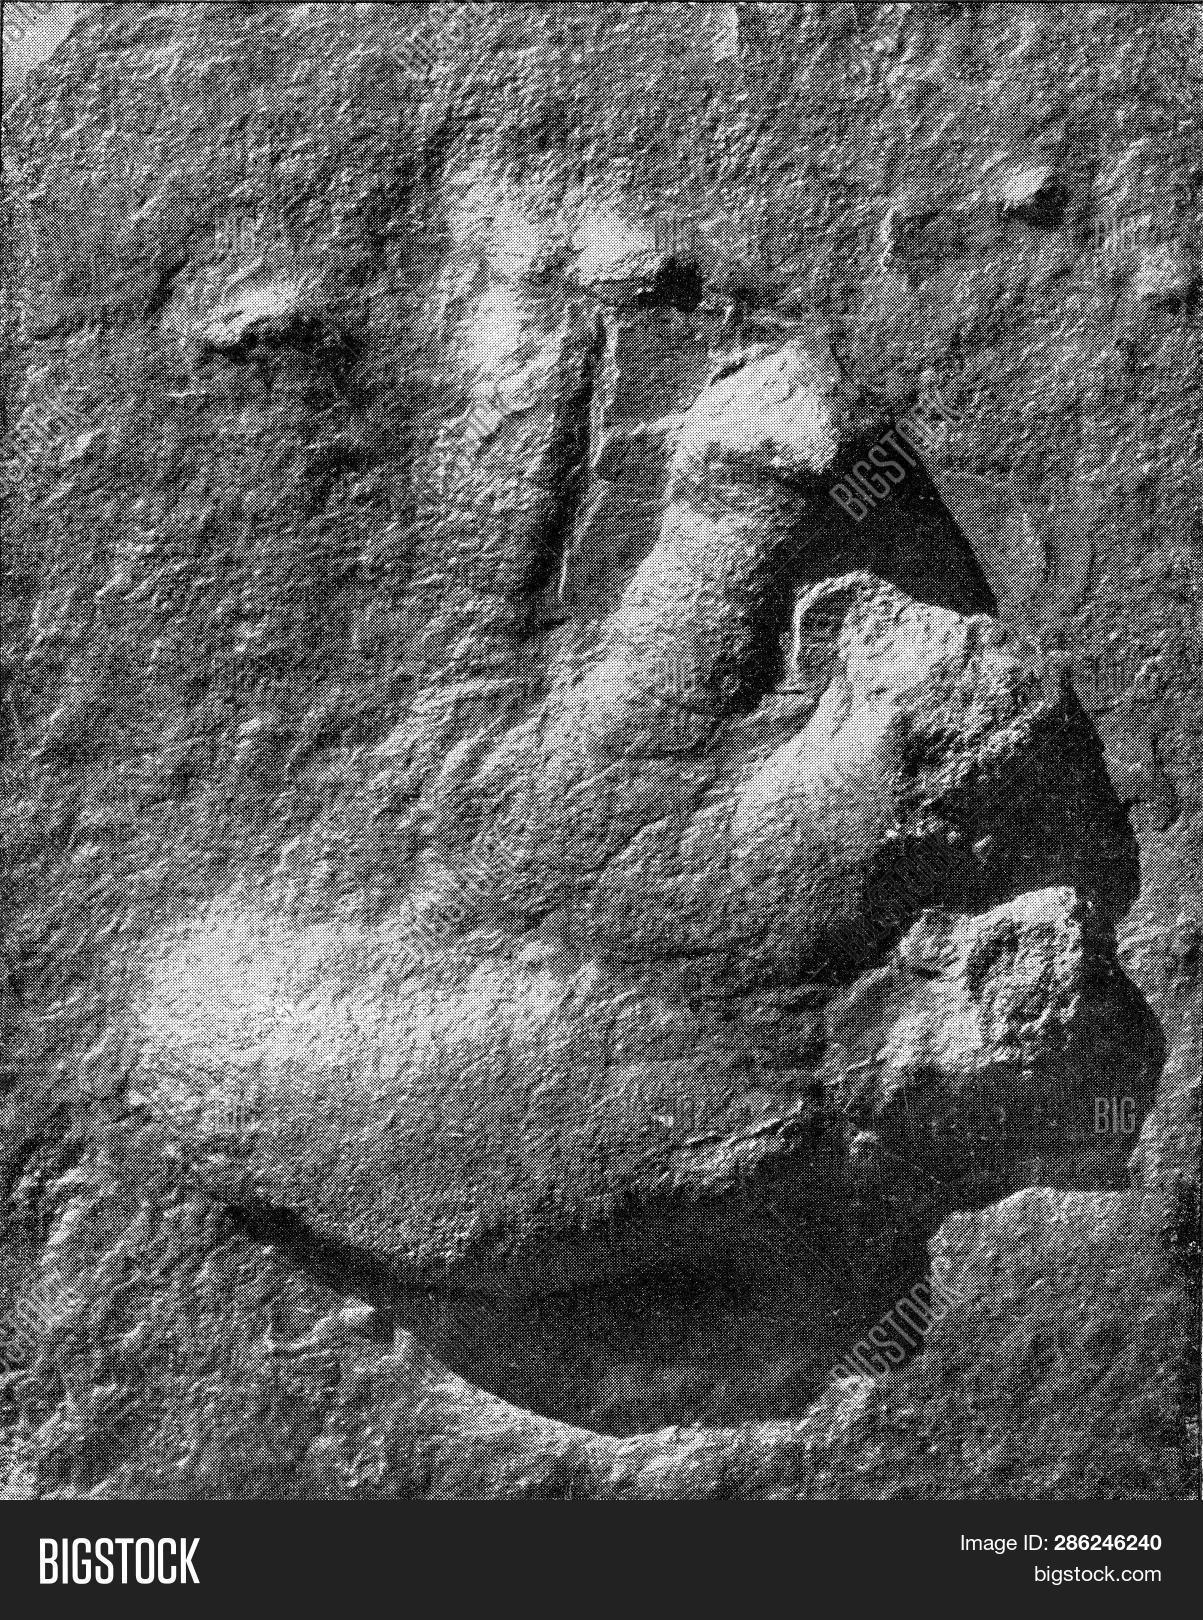 Footprint Vertebrate Image & Photo (Free Trial) | Bigstock